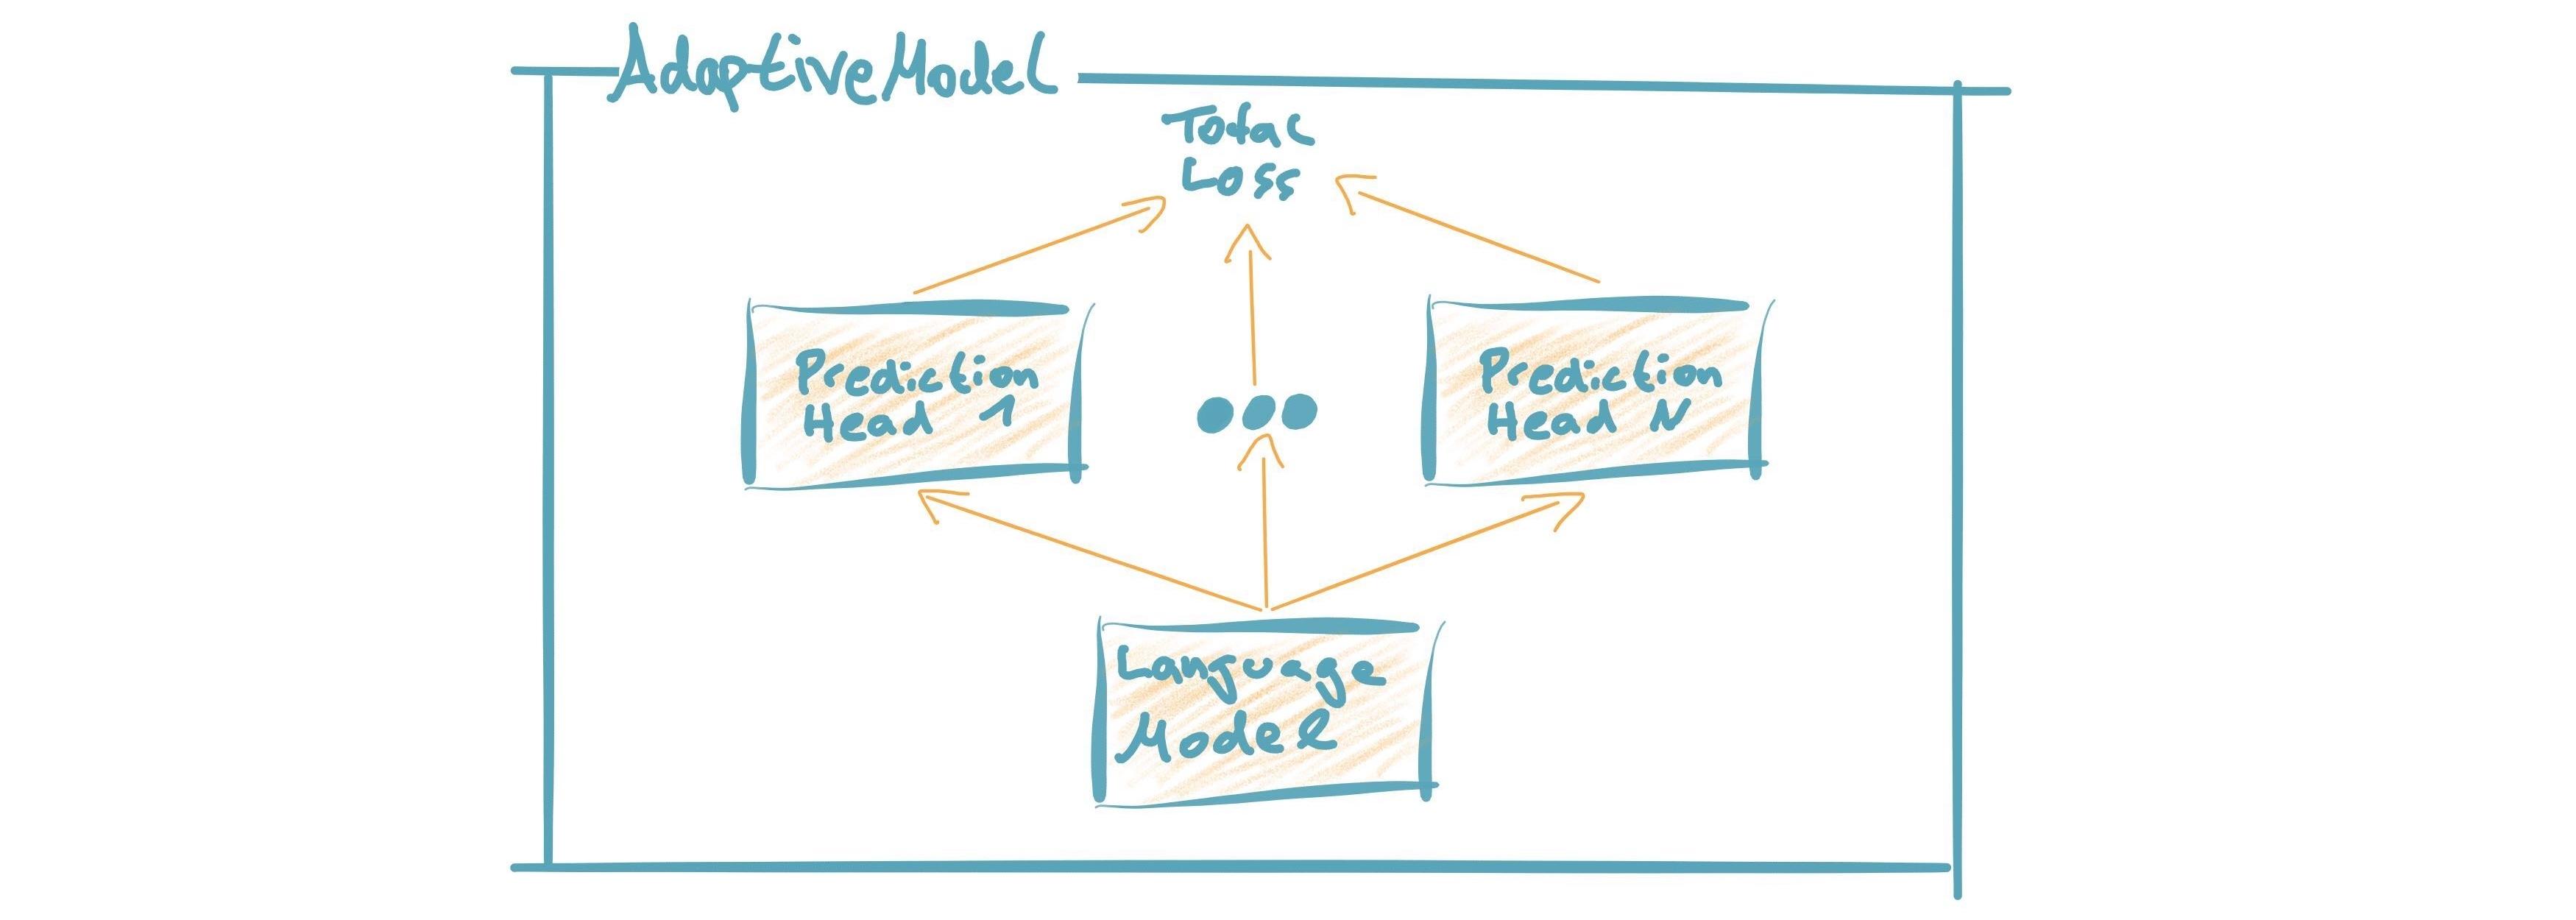 https://raw.githubusercontent.com/deepset-ai/FARM/master/docs/img/adaptive_model_no_bg_small.jpg